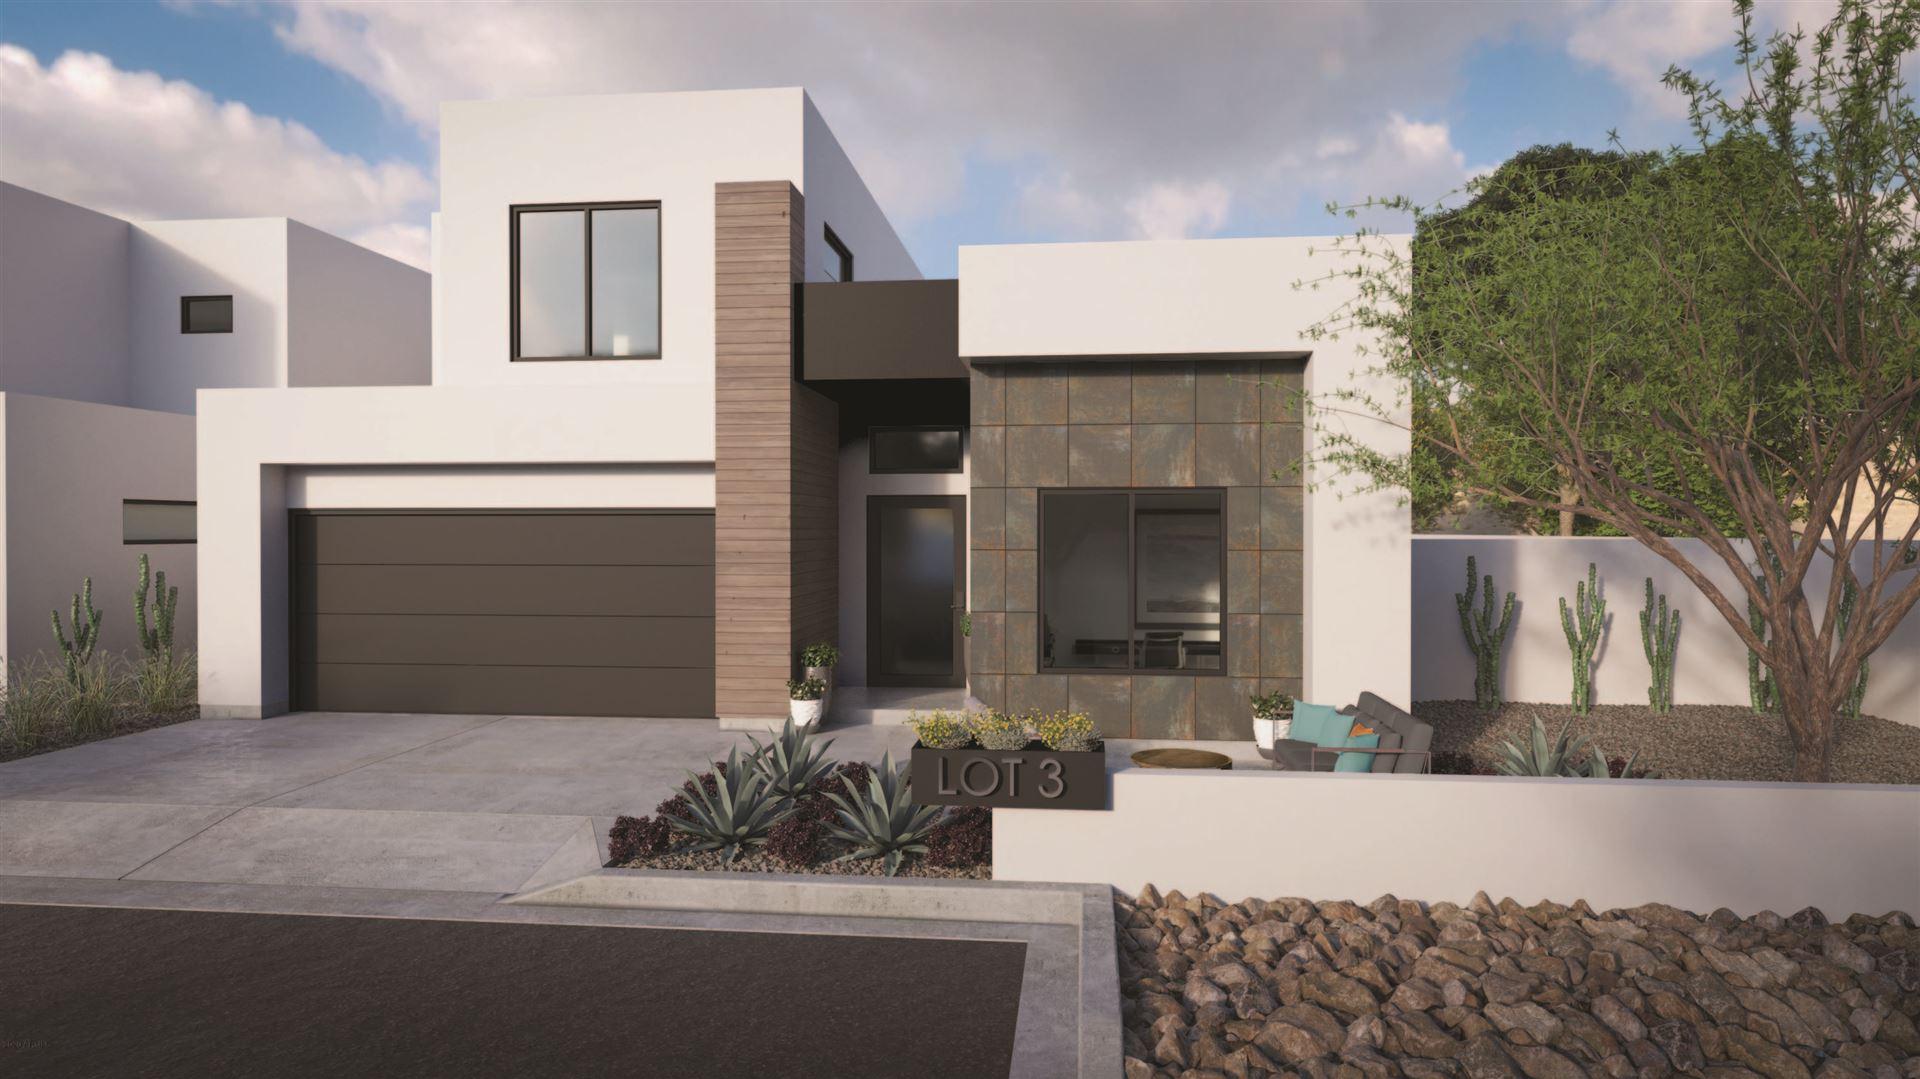 3600 N 31ST Street #3, Phoenix, AZ 85016 - MLS#: 6054727